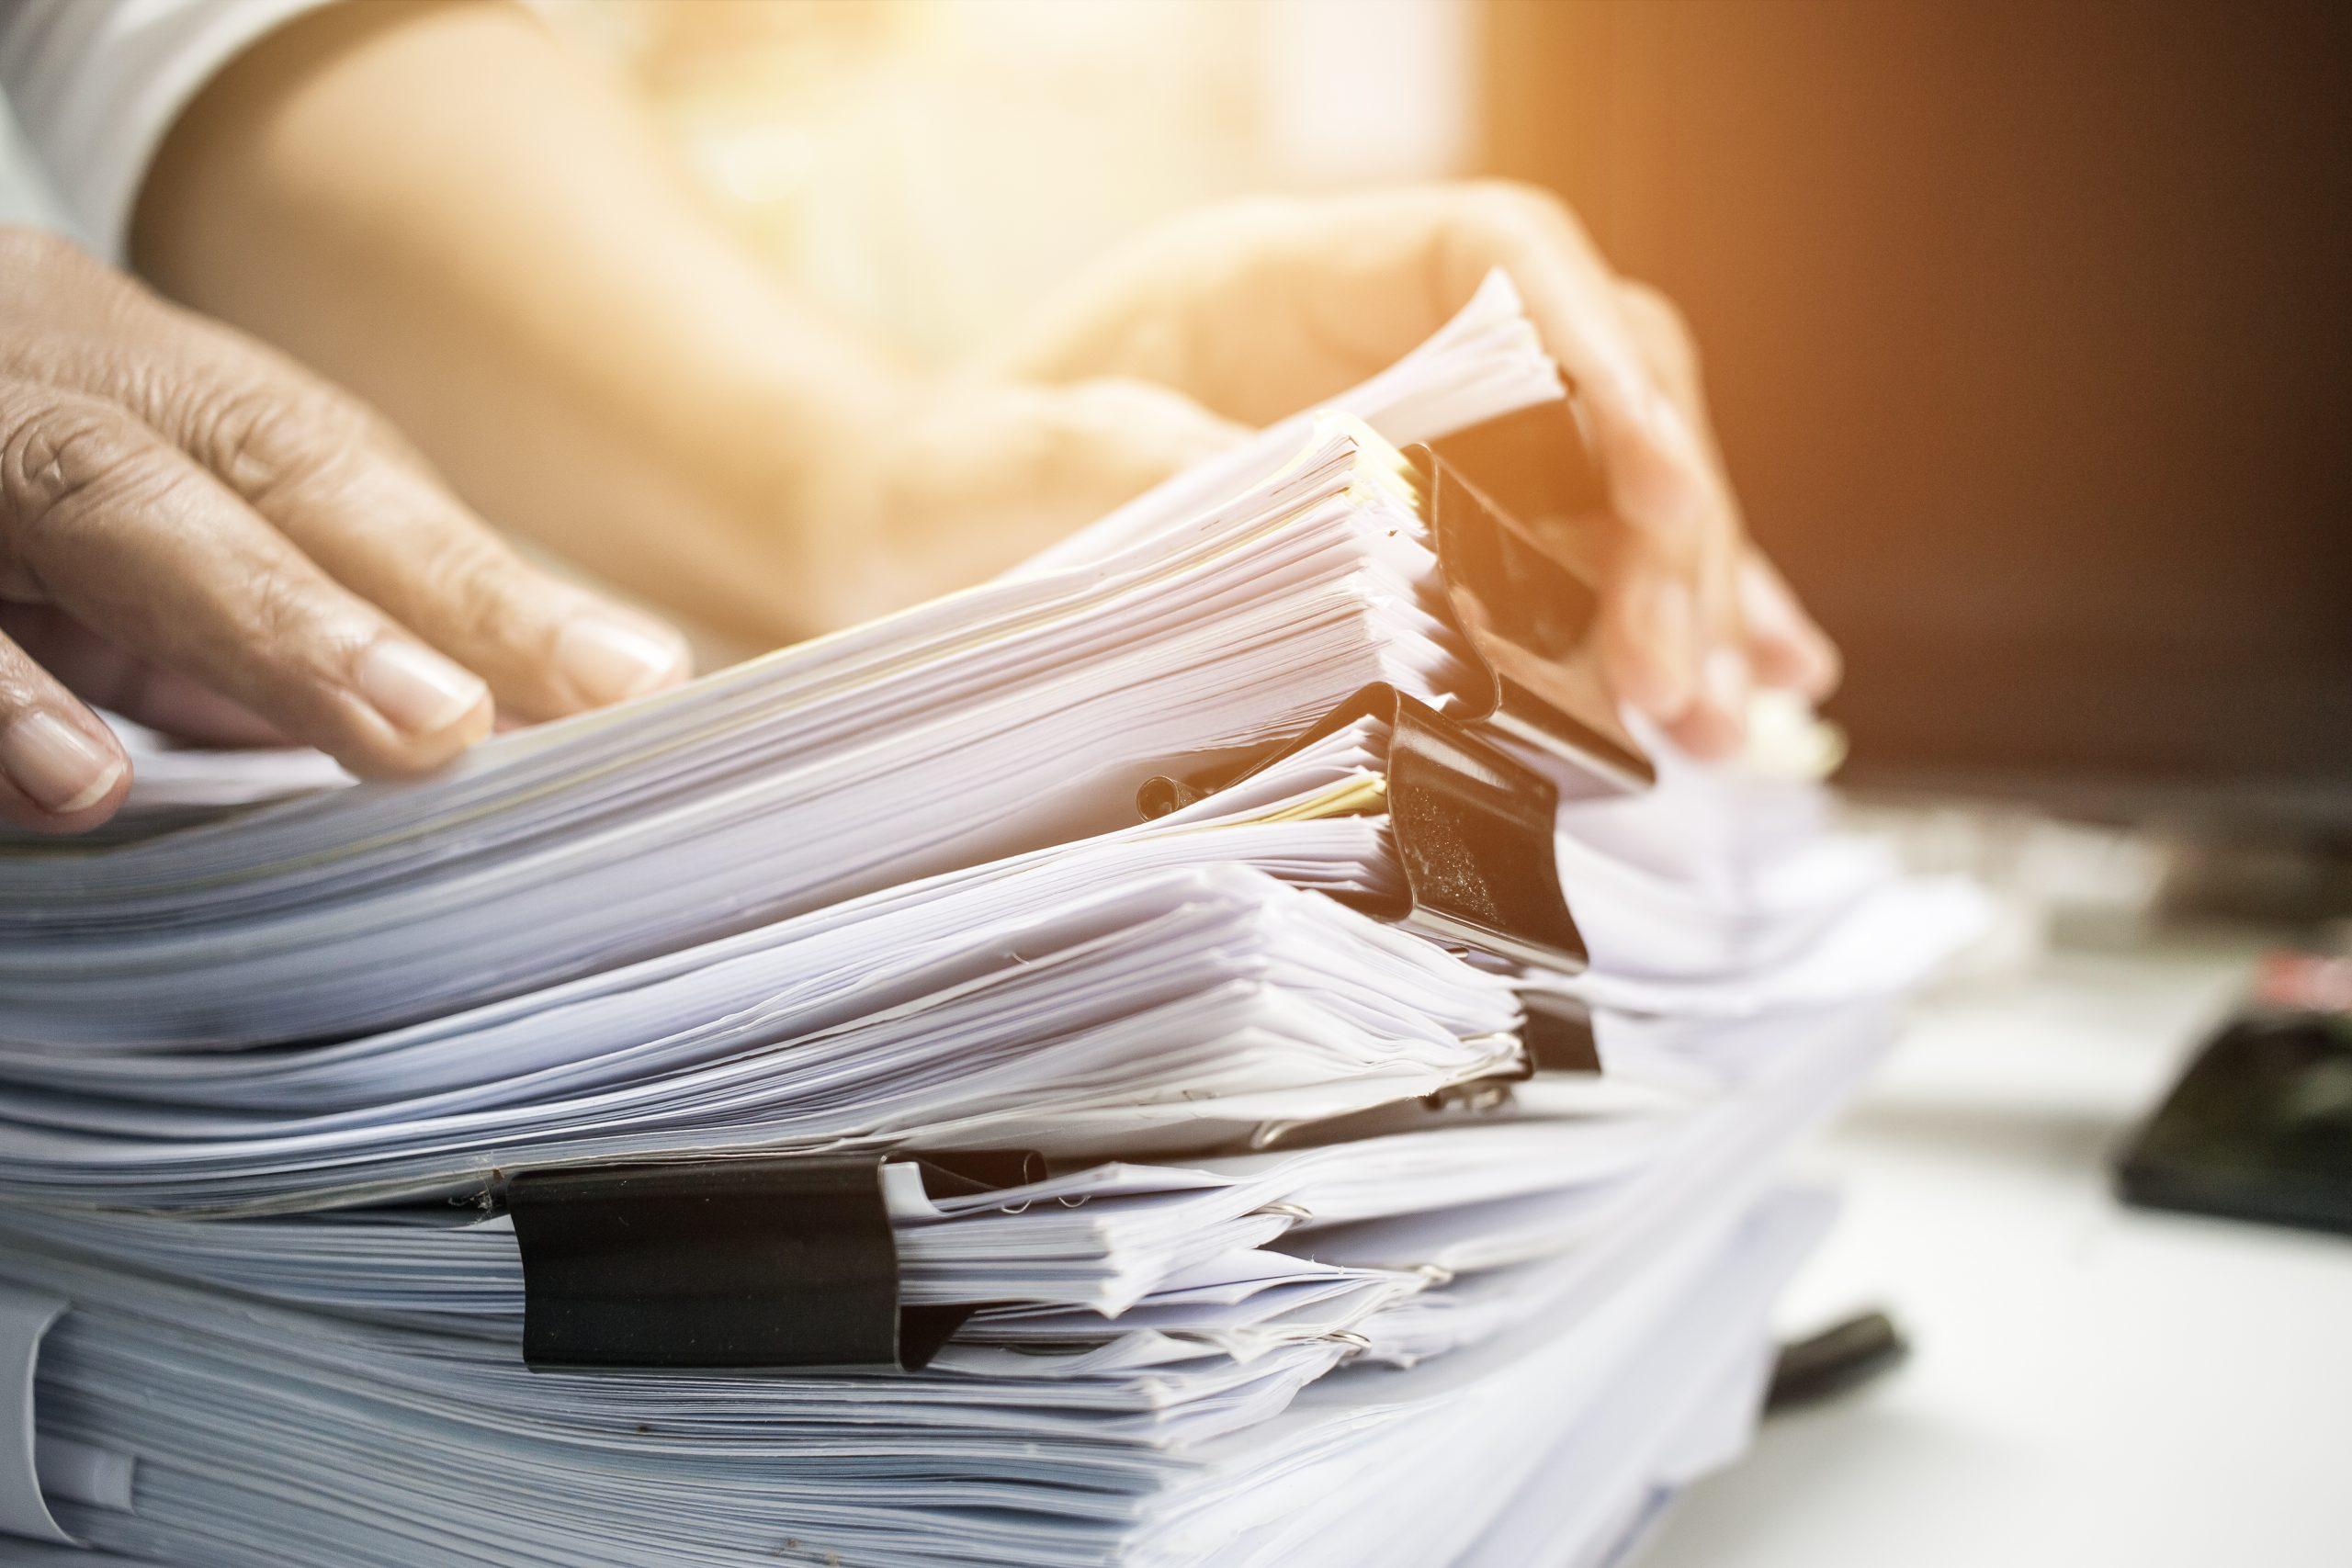 Imagen de papeles para realizar gestiones administrativas